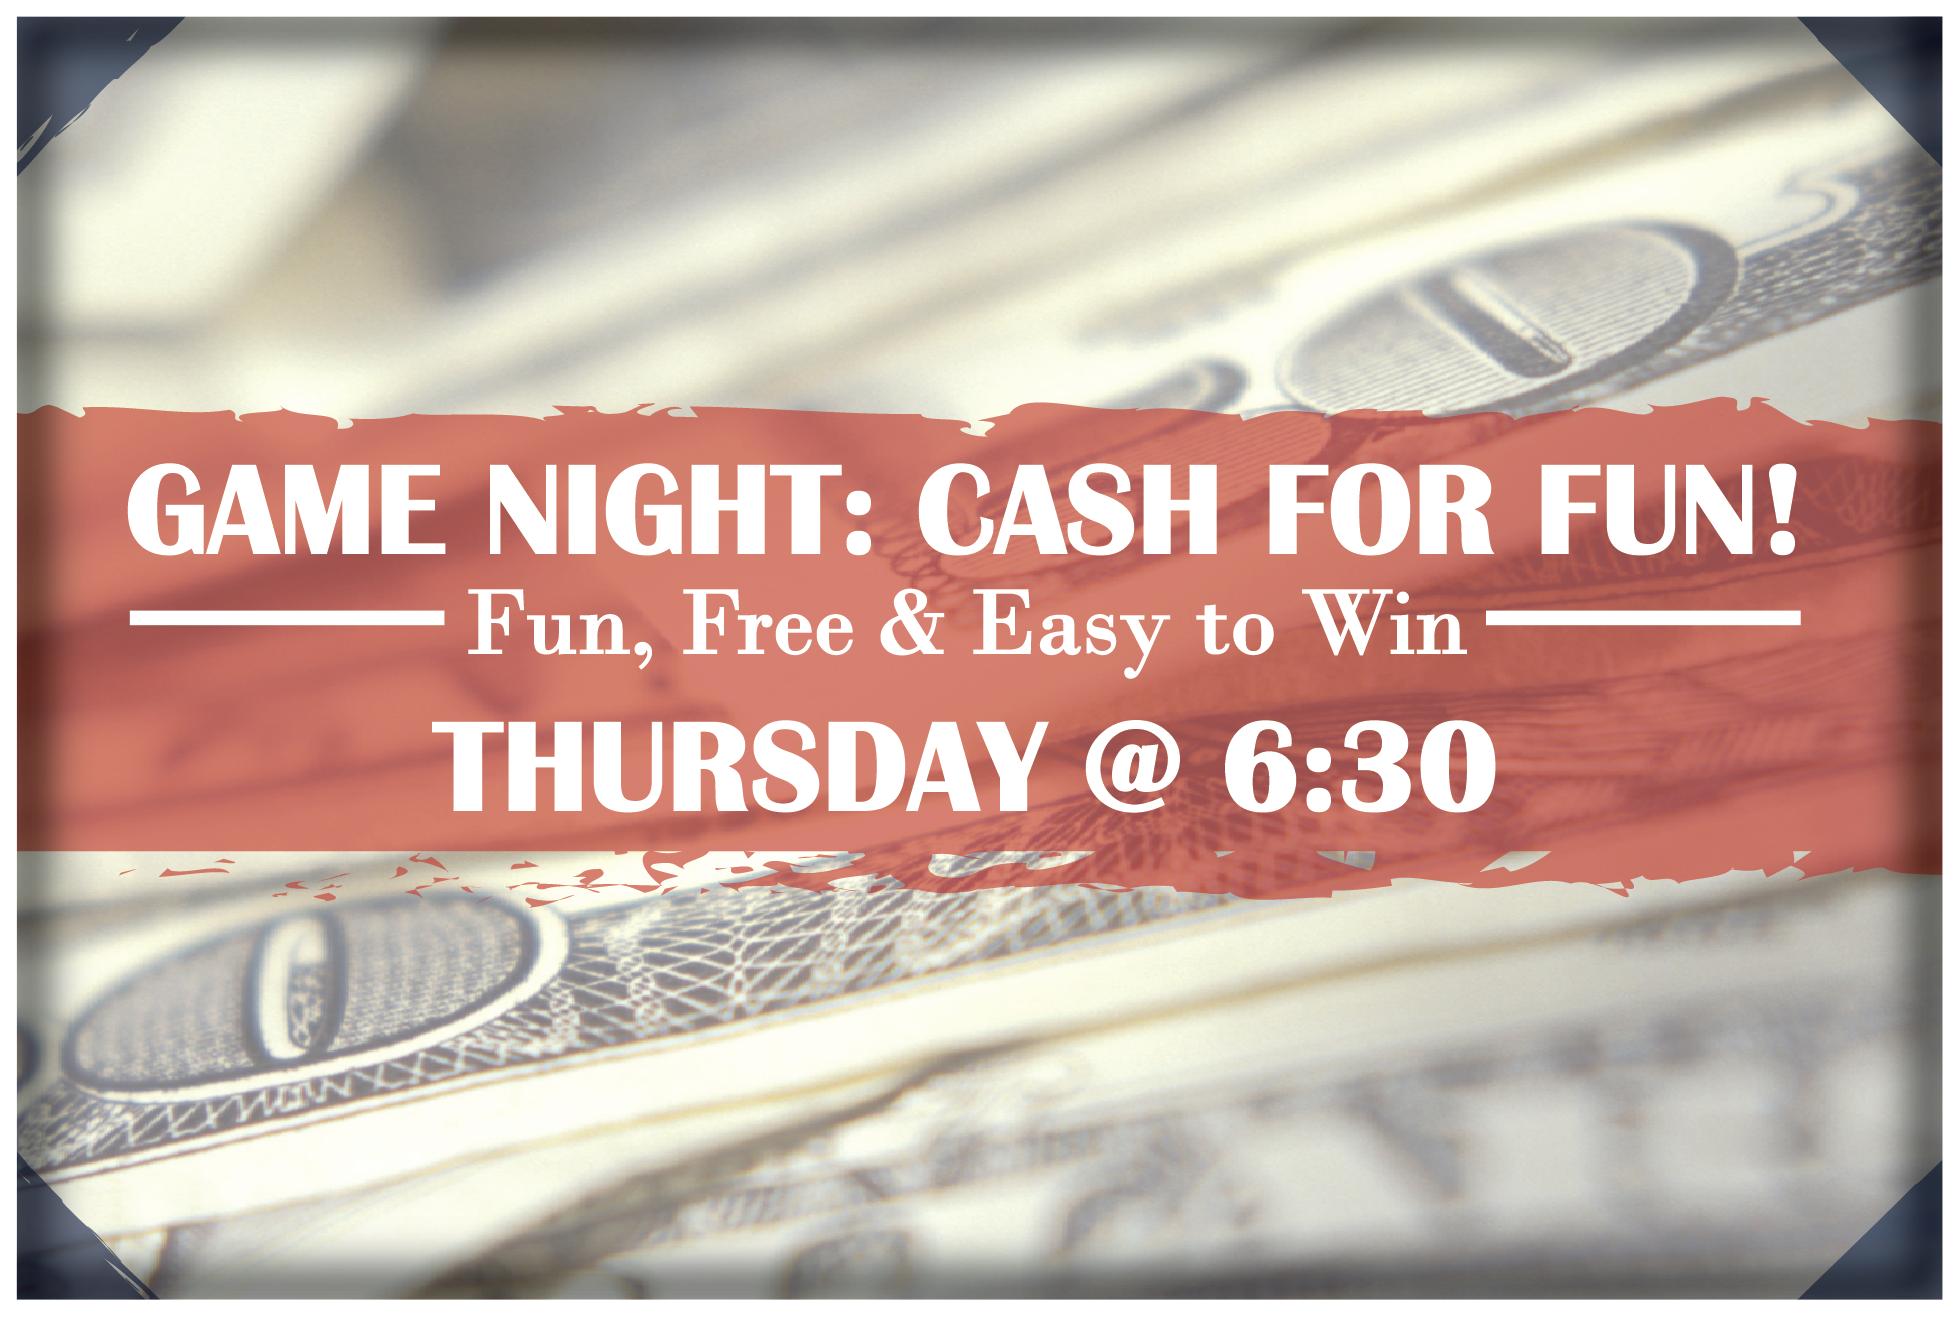 GameNight CashforFunArtboard 11@300x.png